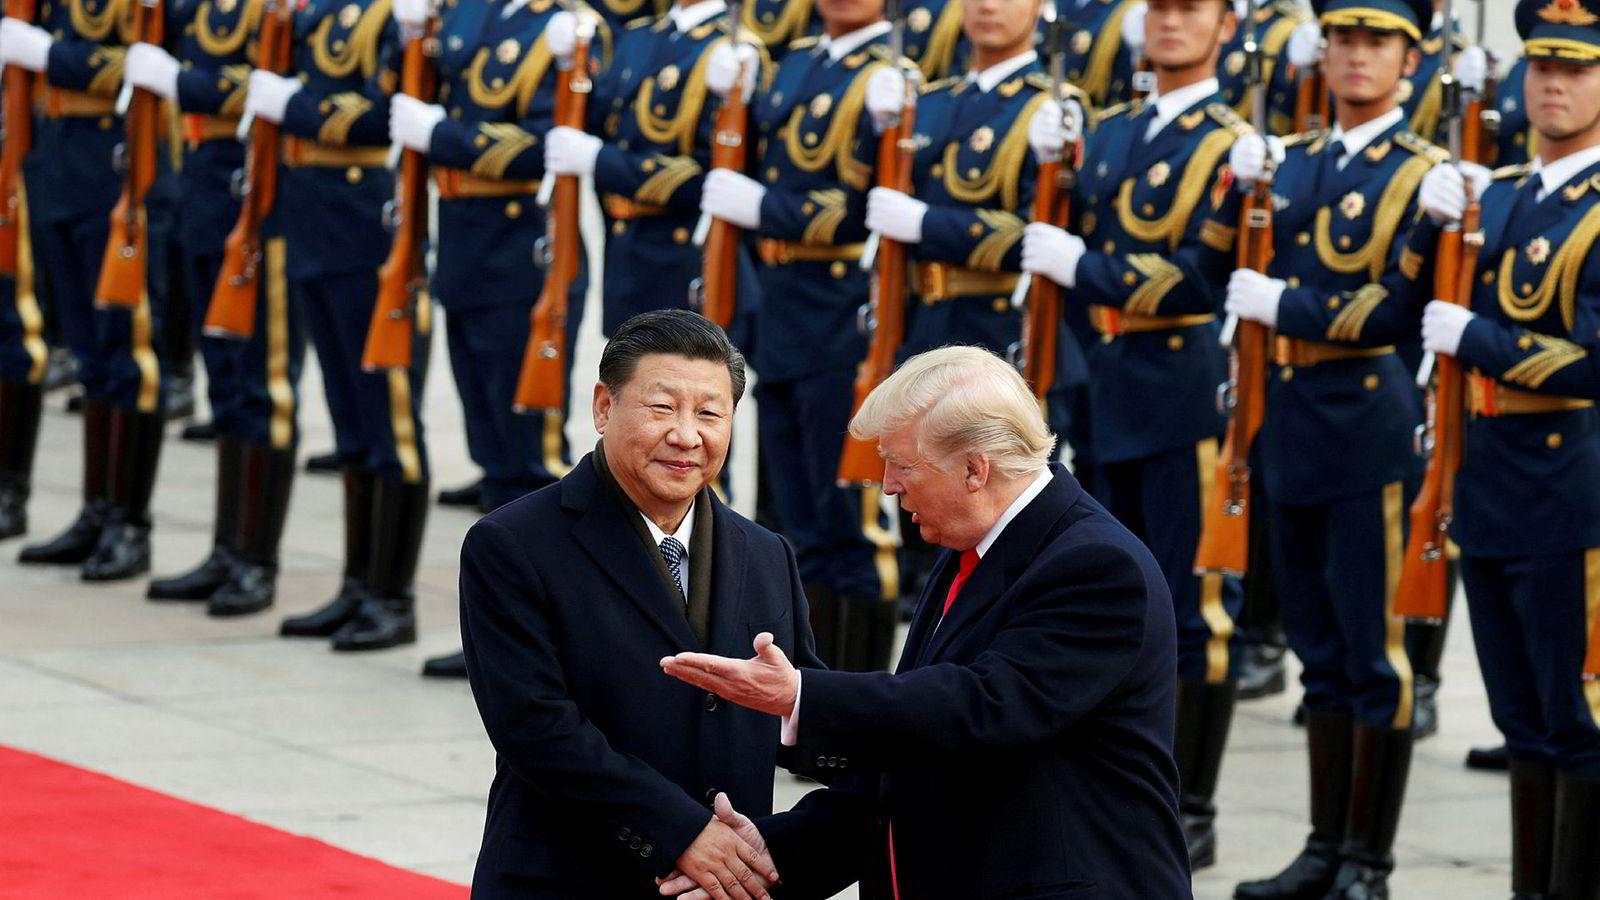 Kinas president Xi Jinping antyder at handelskrigen med USA og Donald Trump kan vare. Her fra et tidligere møte mellom de to i Beijing.